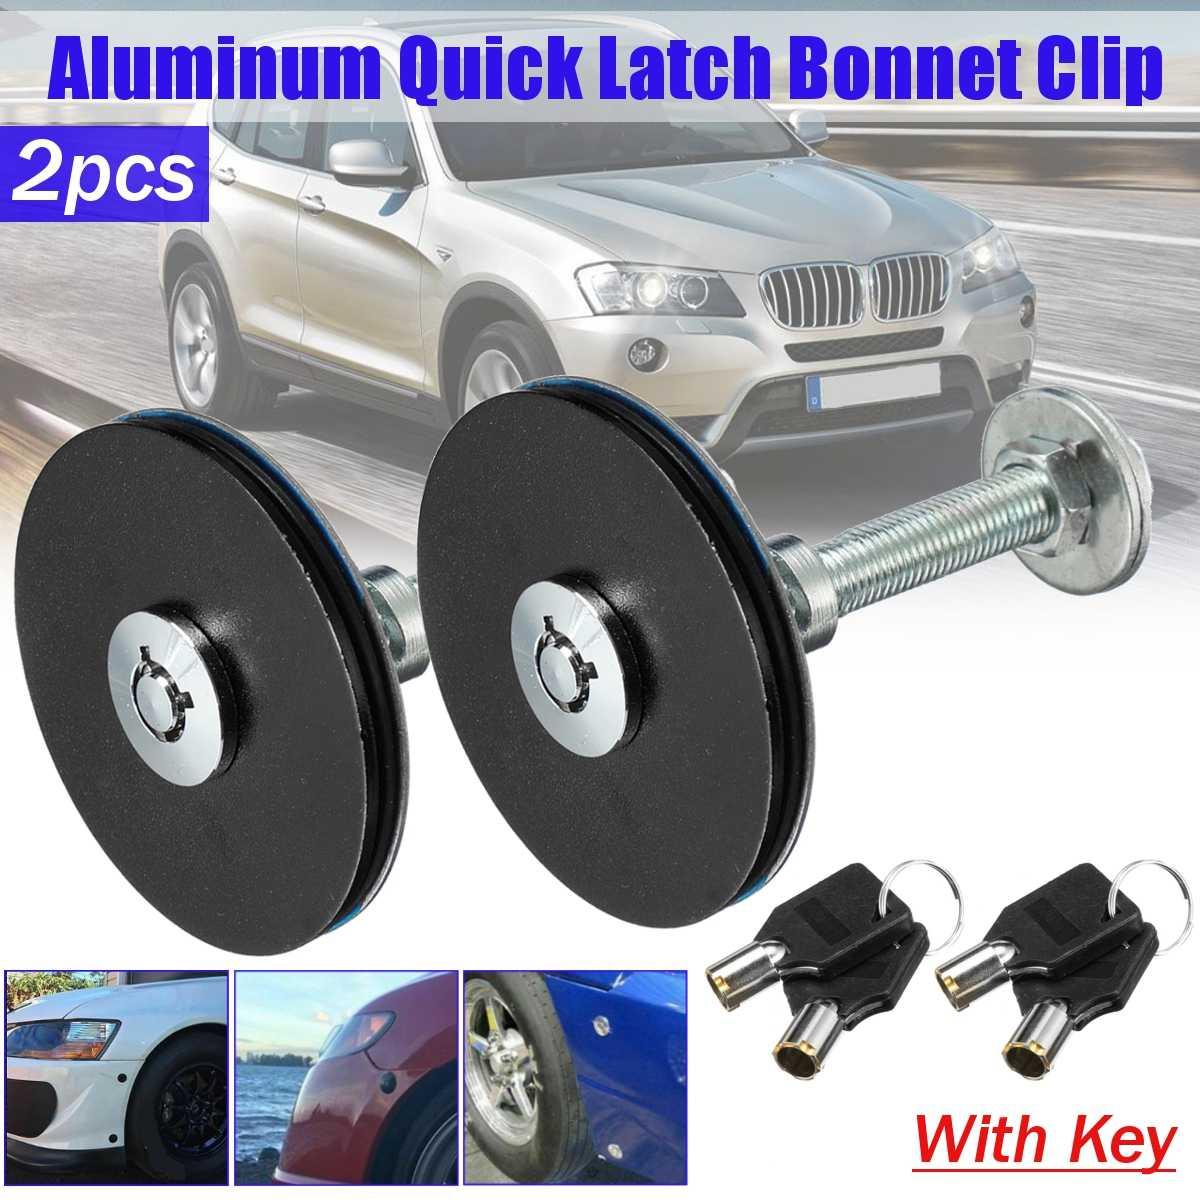 2X Universal Racing Car Bonnet Plus Flush Hood Latch Pin With Key Lock Clip Kit